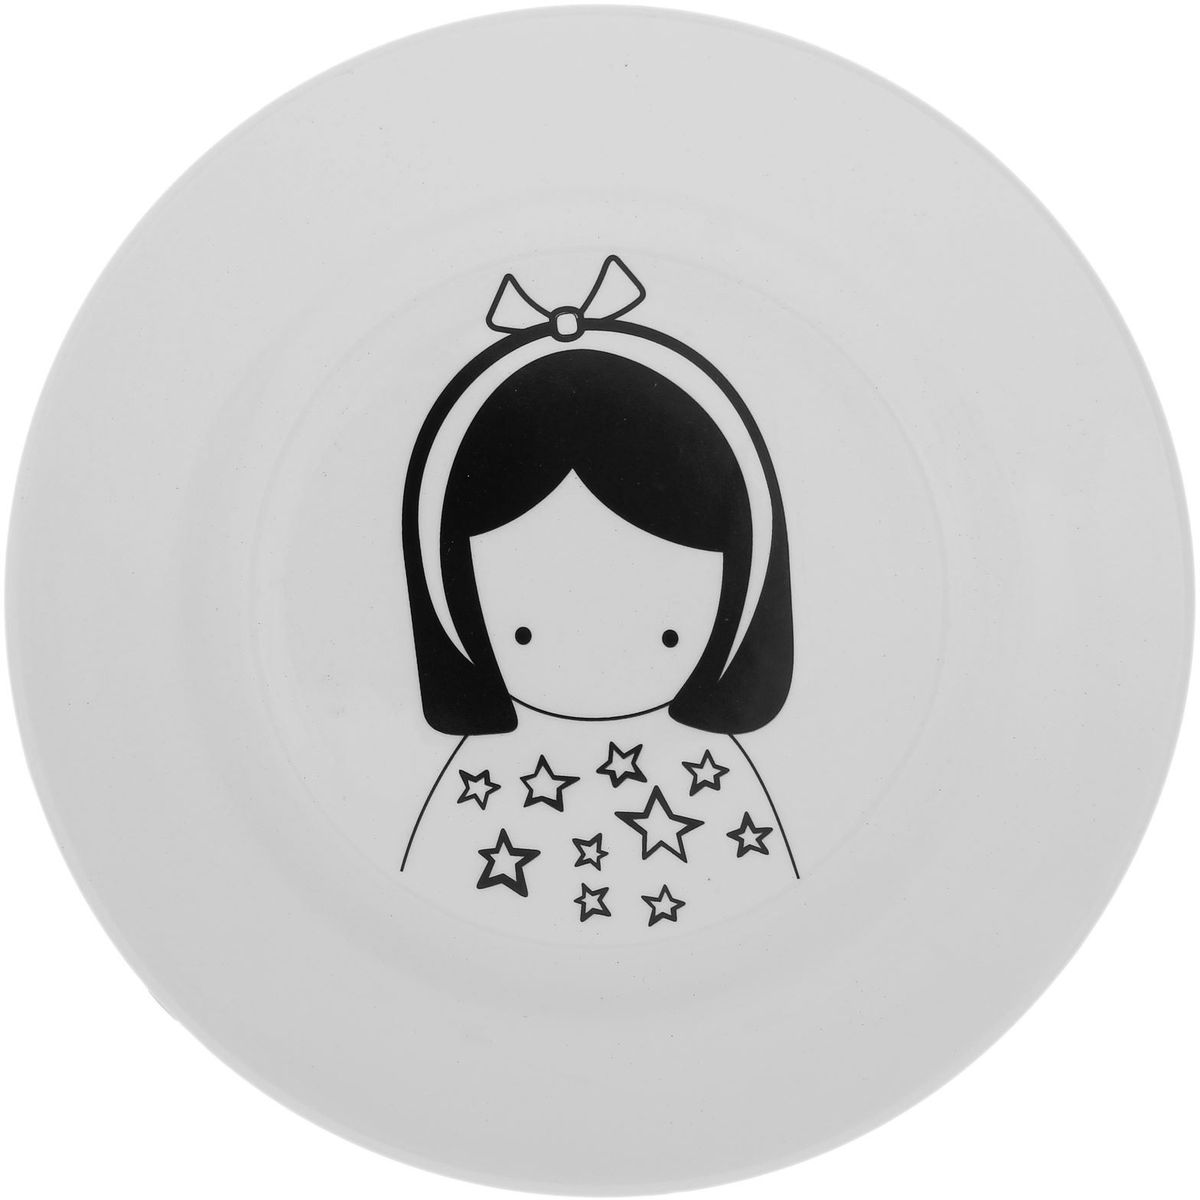 Тарелка мелкая Сотвори чудо Куколка Faien, диаметр 20 см тарелка мелкая сотвори чудо полярный мишка диаметр 20 см